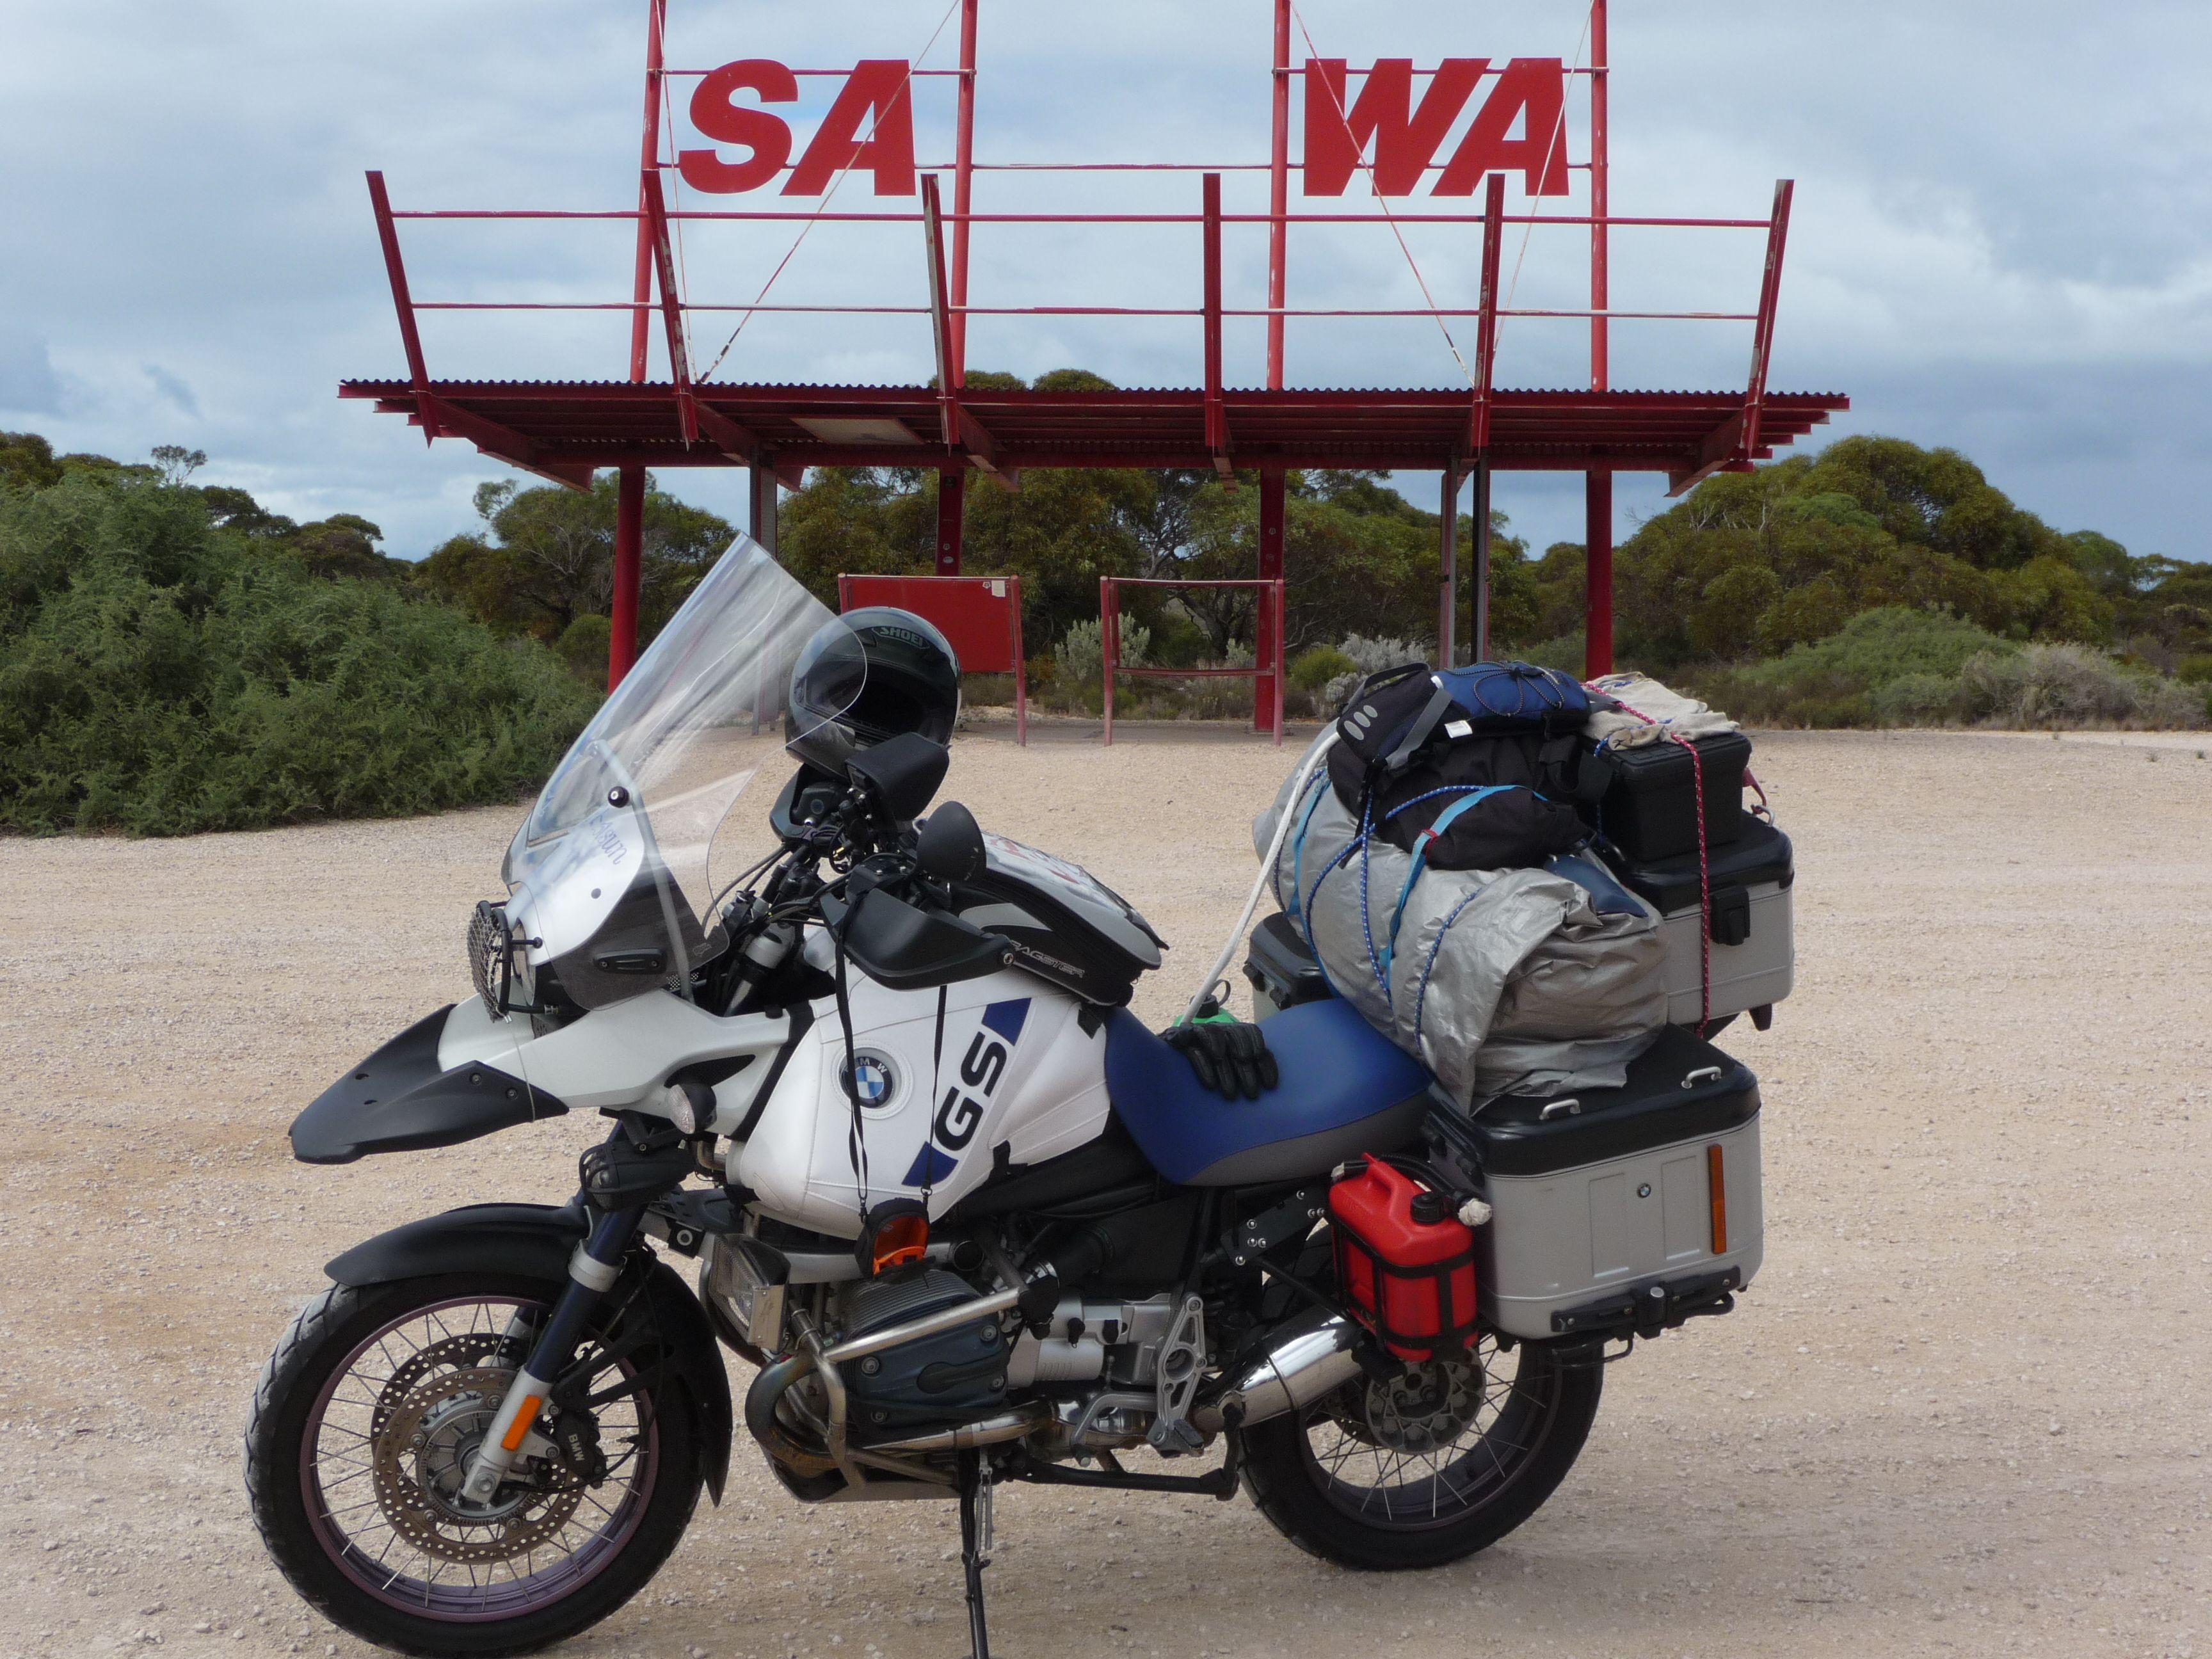 BMW R1150 GSA - Around Australia in 40 days- Day 3. And no ...